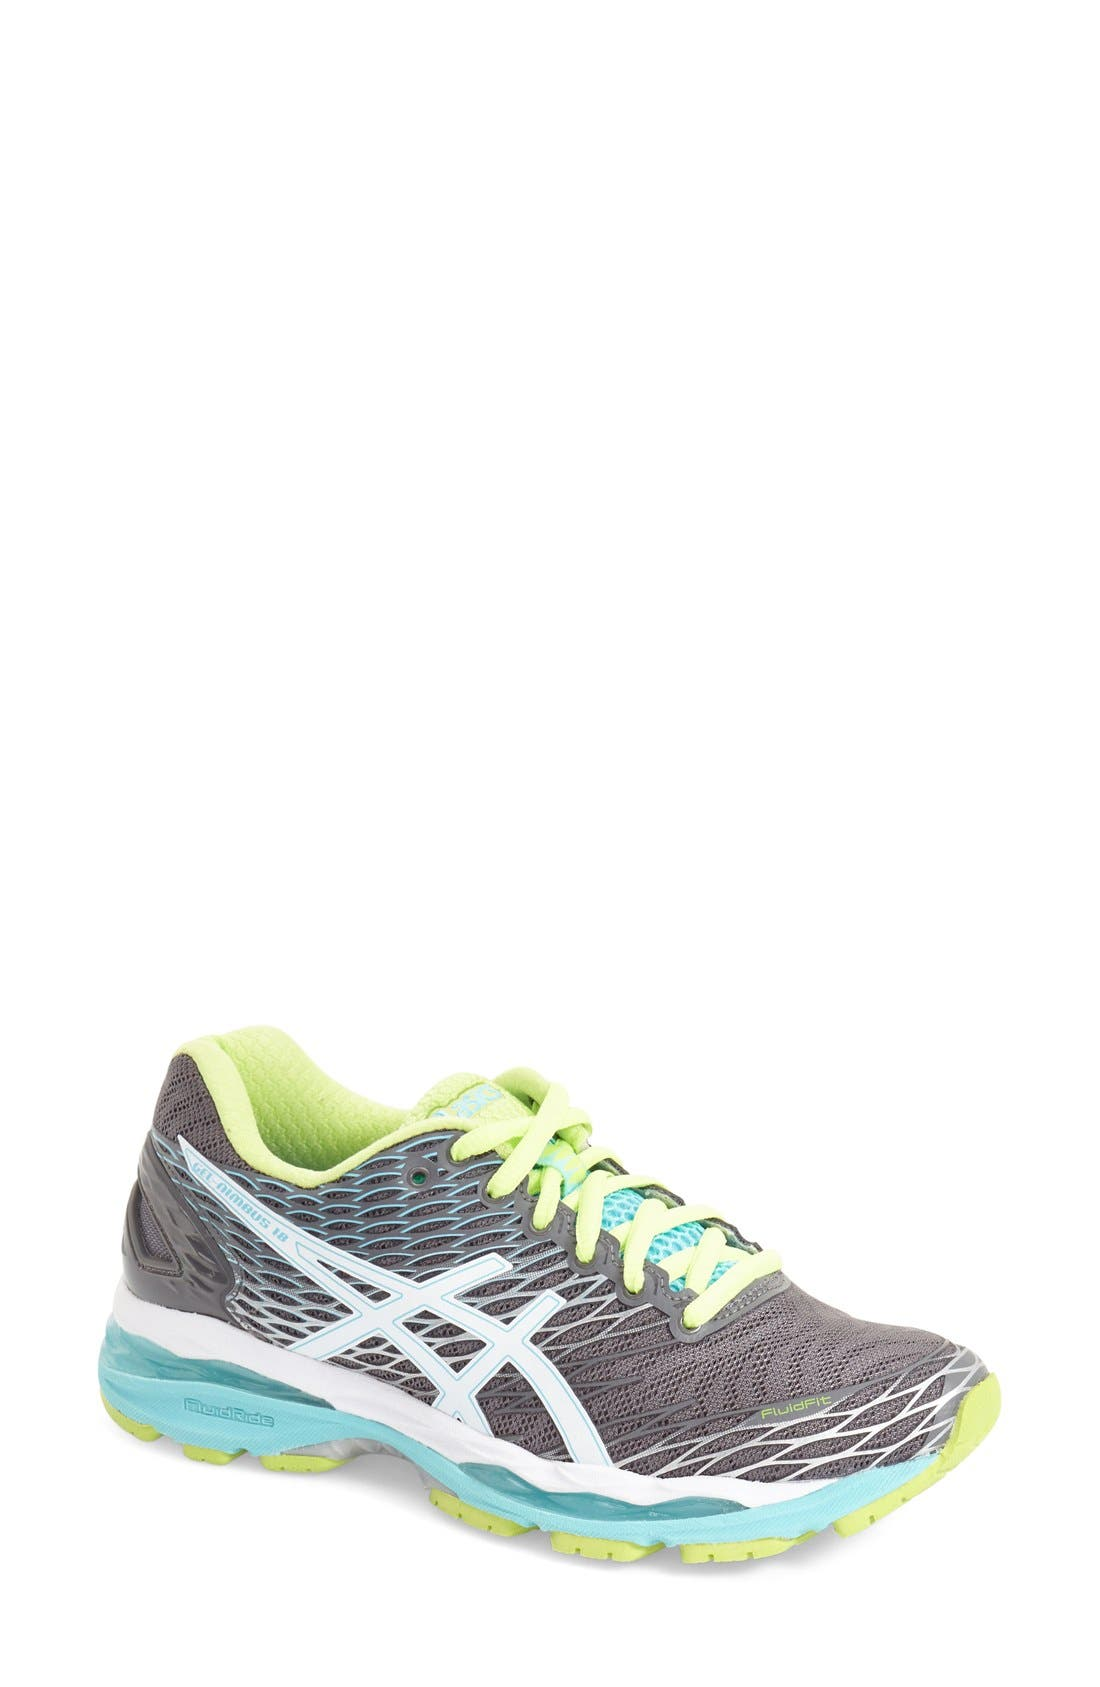 Main Image - ASICS® 'GEL-Nimbus 18' Running Shoe (Women)